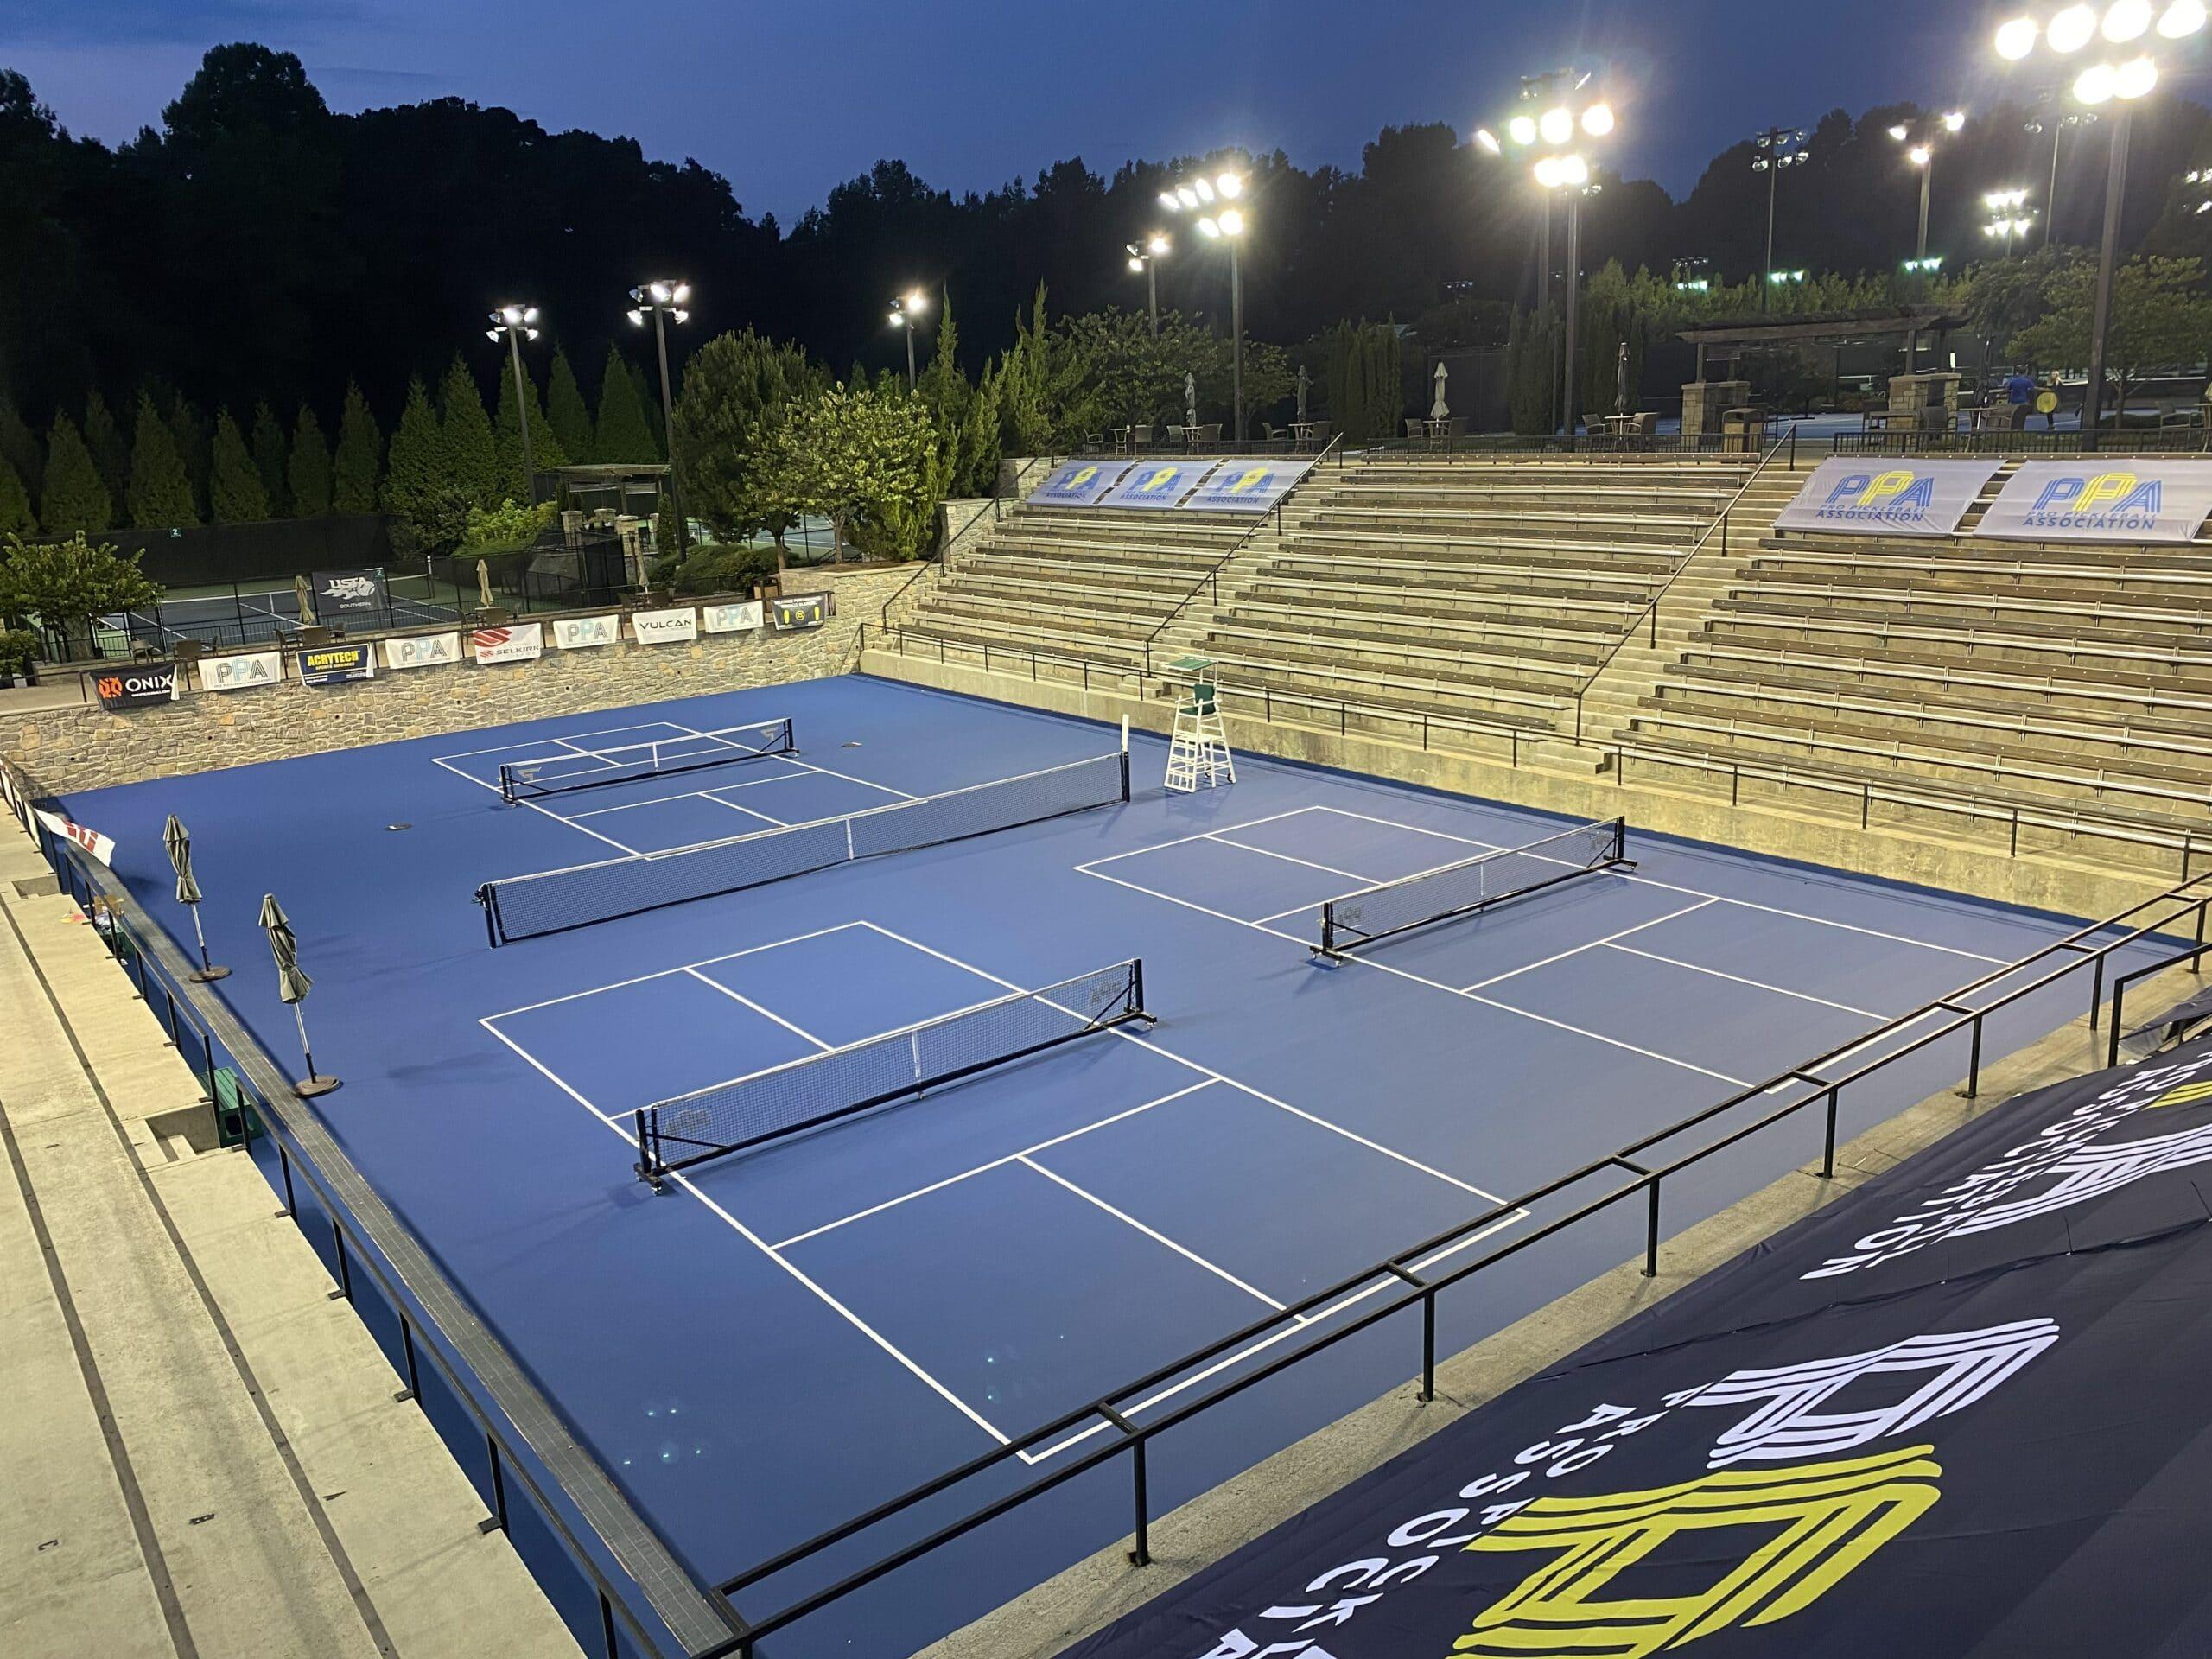 Professional Pickleball Association Championship Court